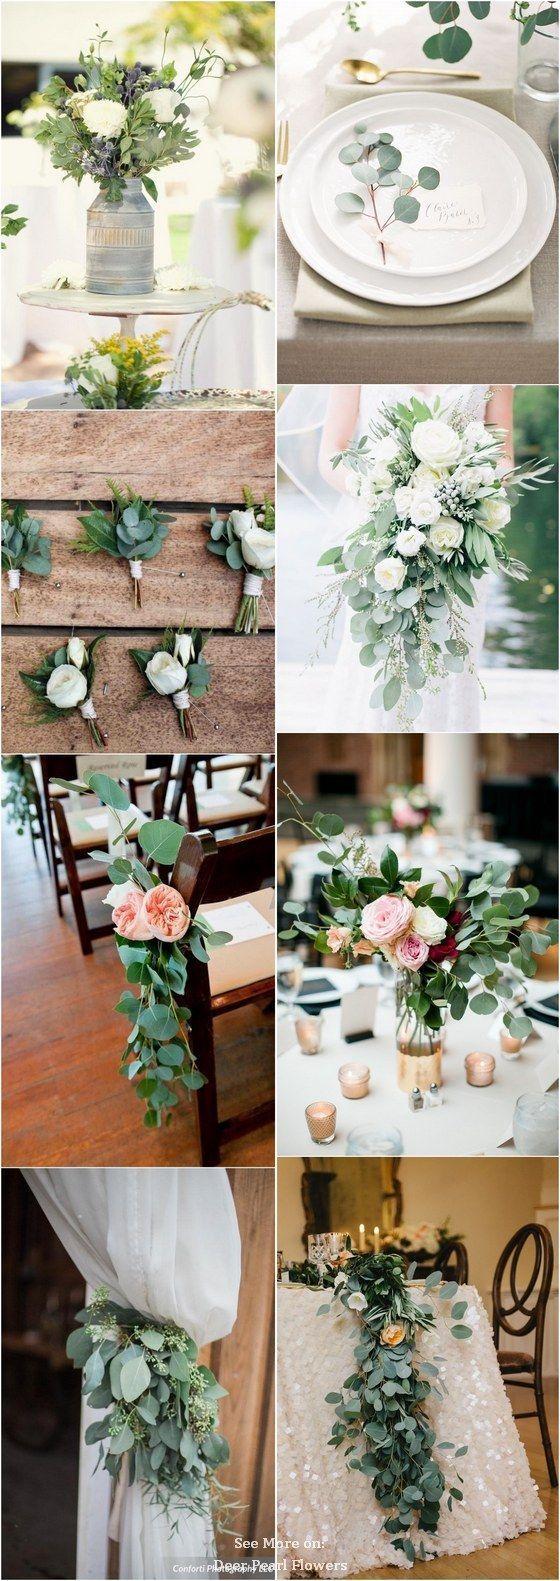 Wedding decoration ideas colors  Eucalyptus green wedding color ideas  erpearlflowers